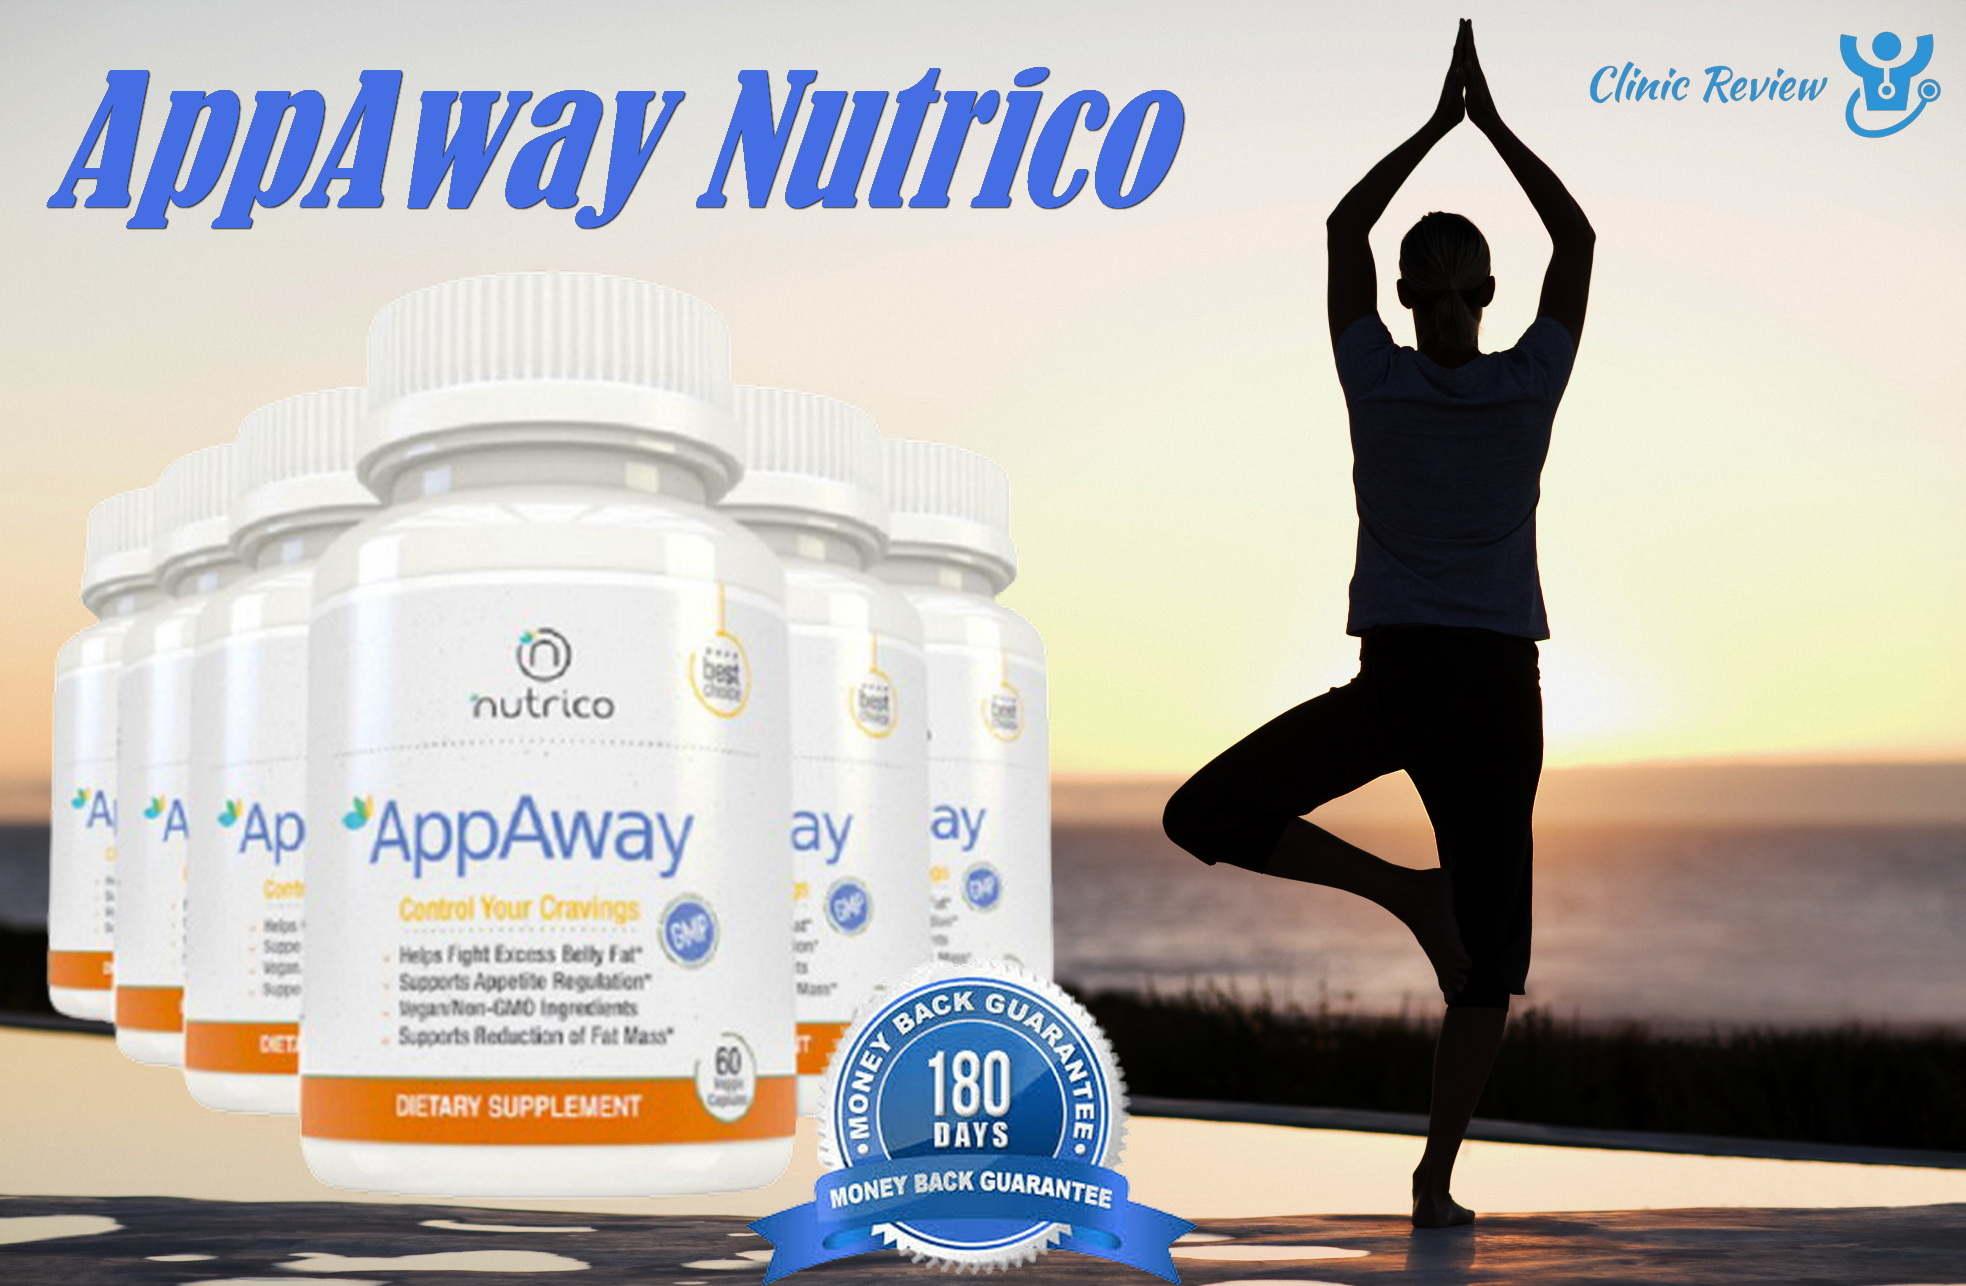 AppAway Weight LossReviews